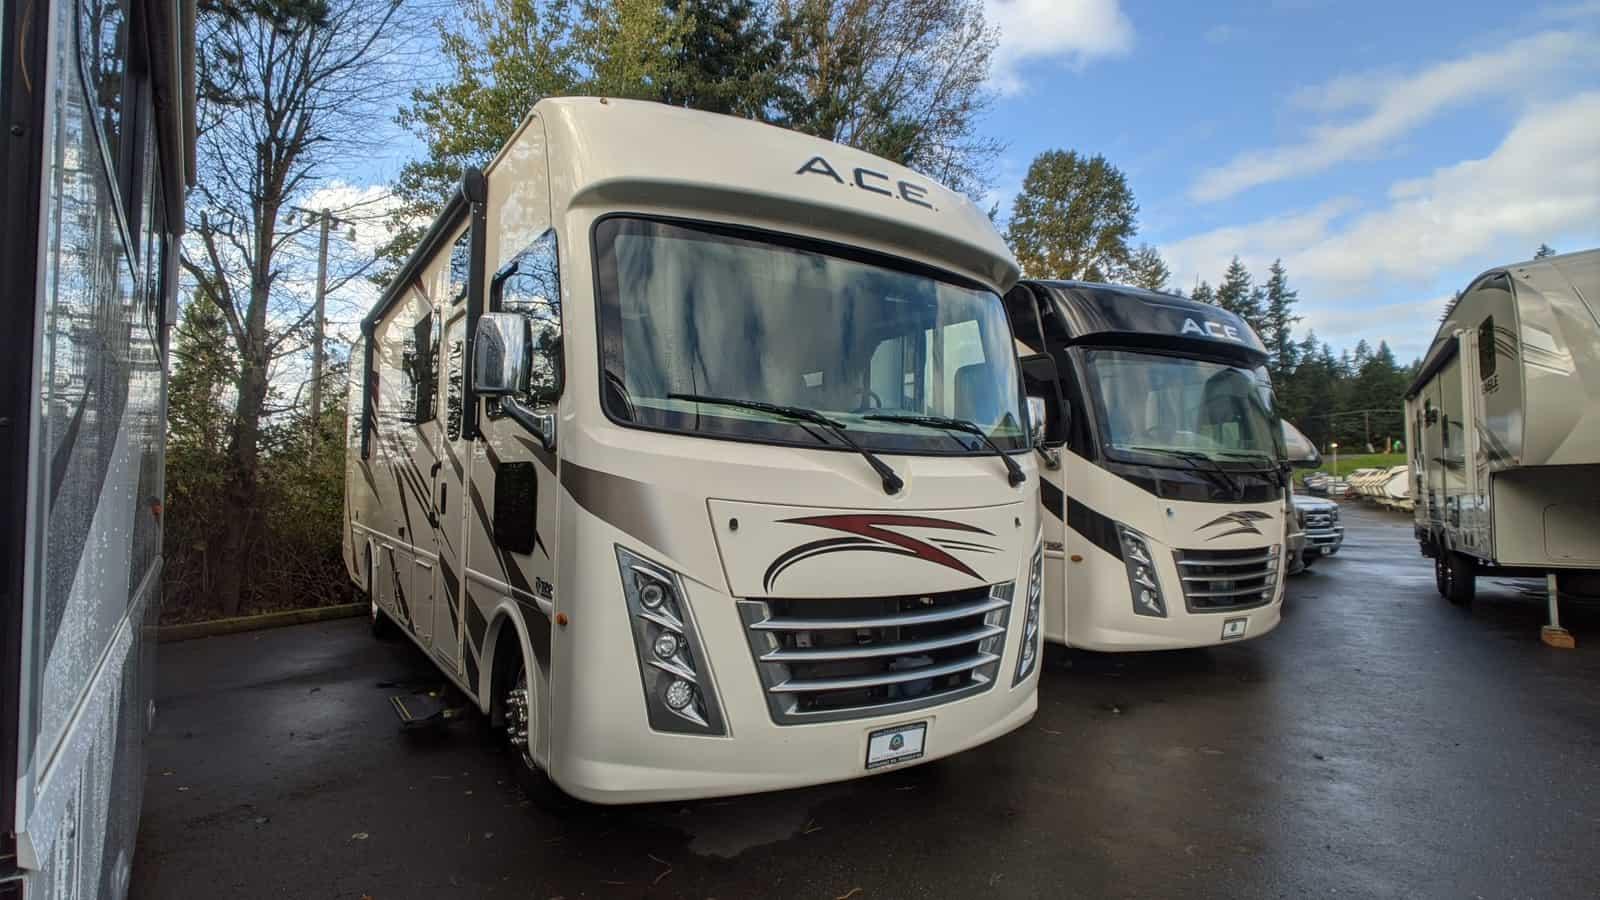 USED 2020 Thor Motor Coach ACE 30.4